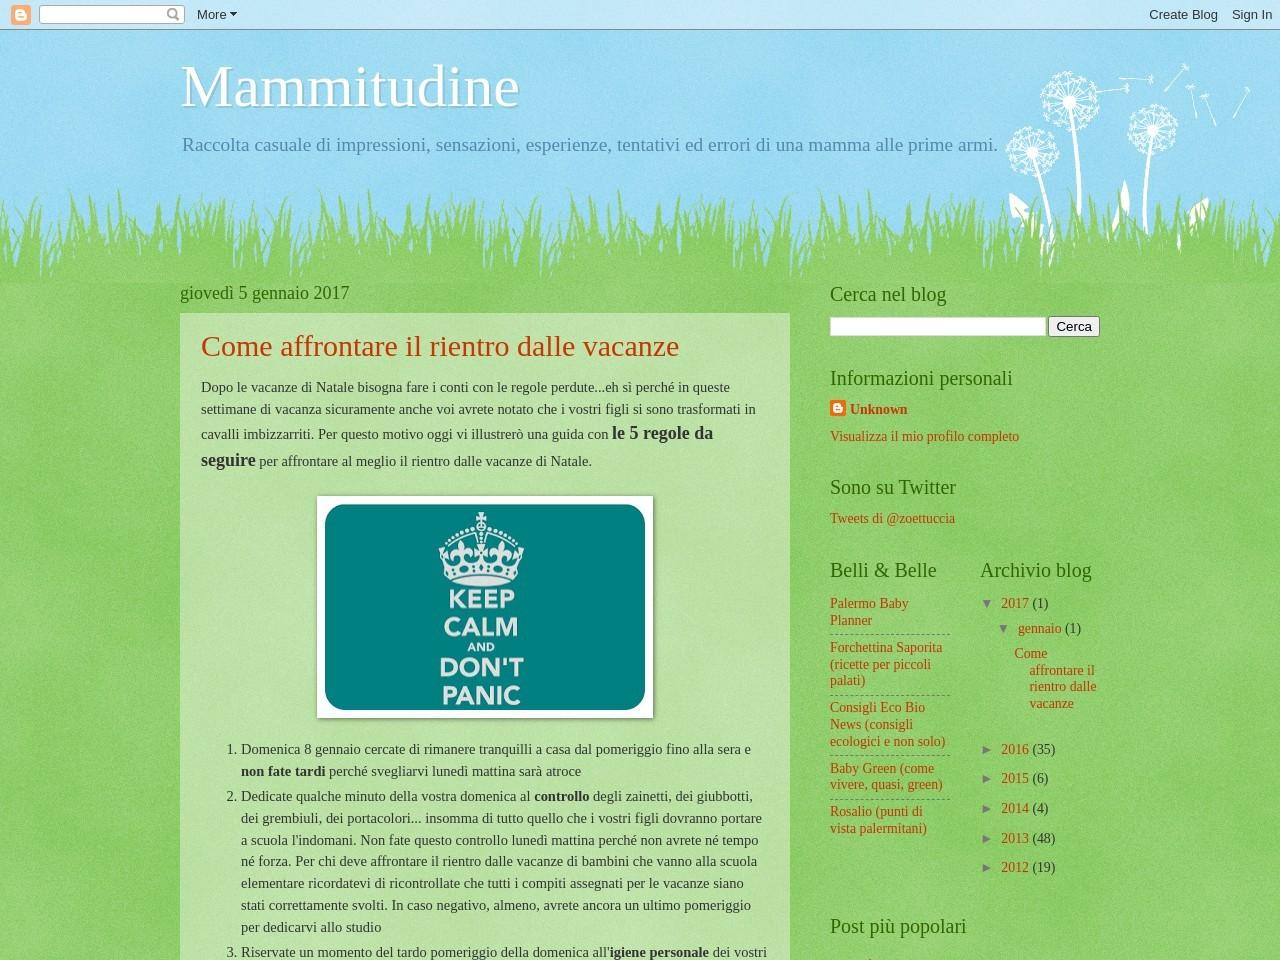 mammitudine